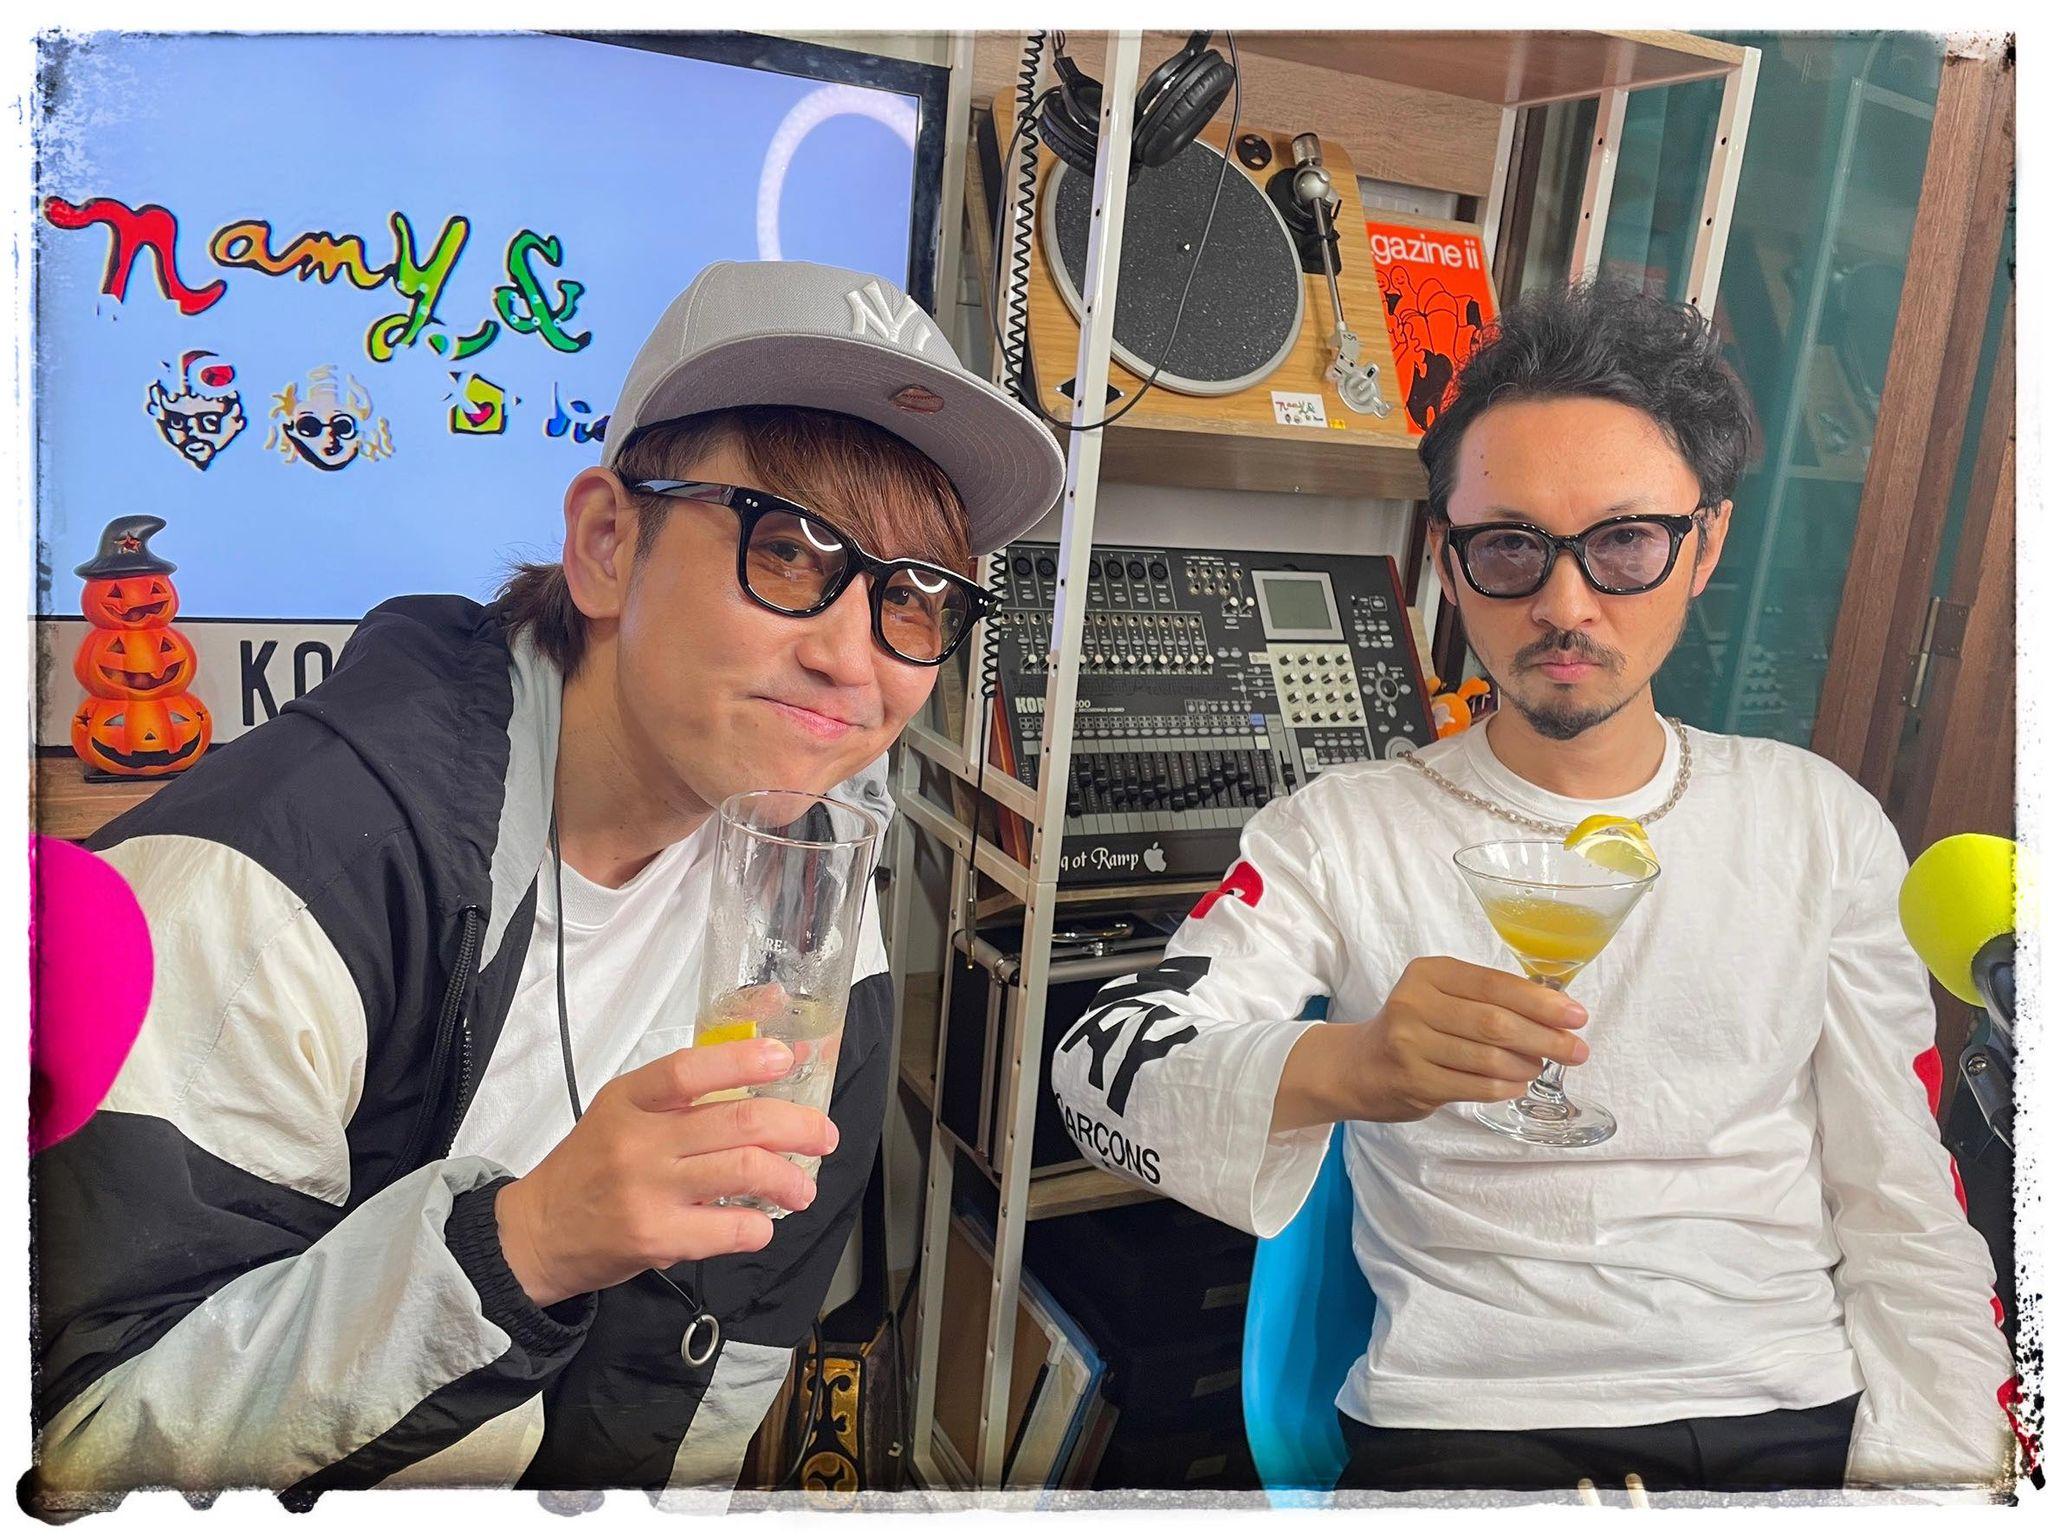 【Namy& home】Guest:MAKOTO (JABBERLOOP)